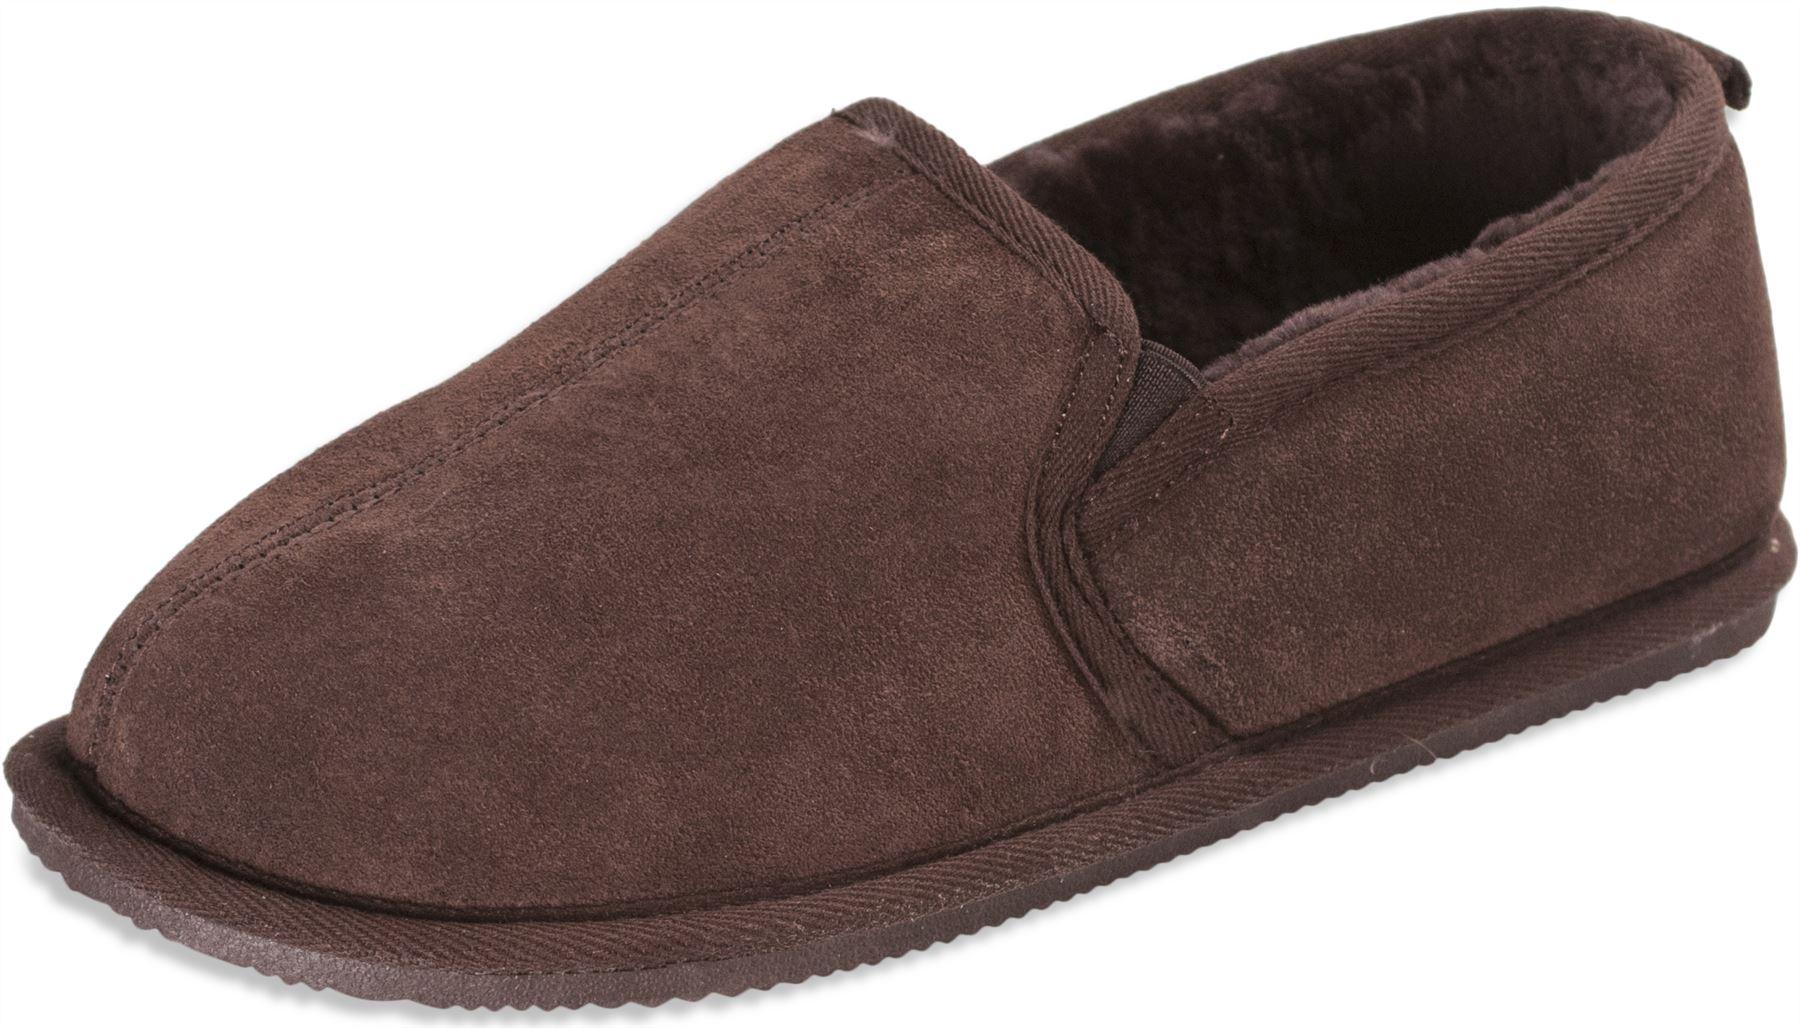 Nordvek-Mens-Genuine-Sheepskin-Slippers-Suede-amp-Hard-